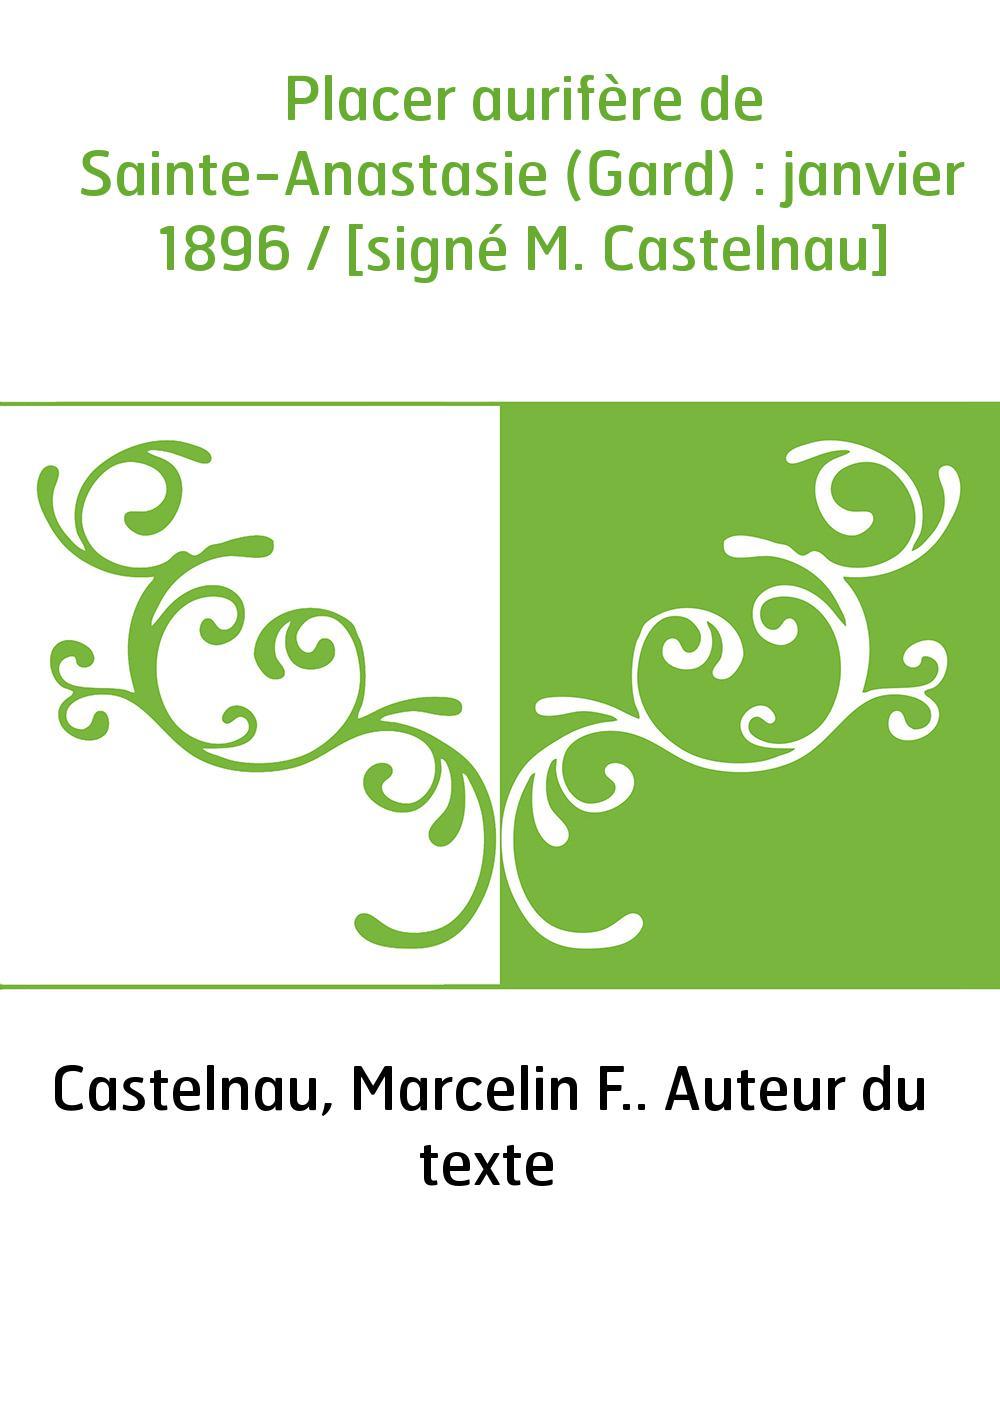 Placer aurifère de Sainte-Anastasie (Gard) : janvier 1896 / [signé M. Castelnau]